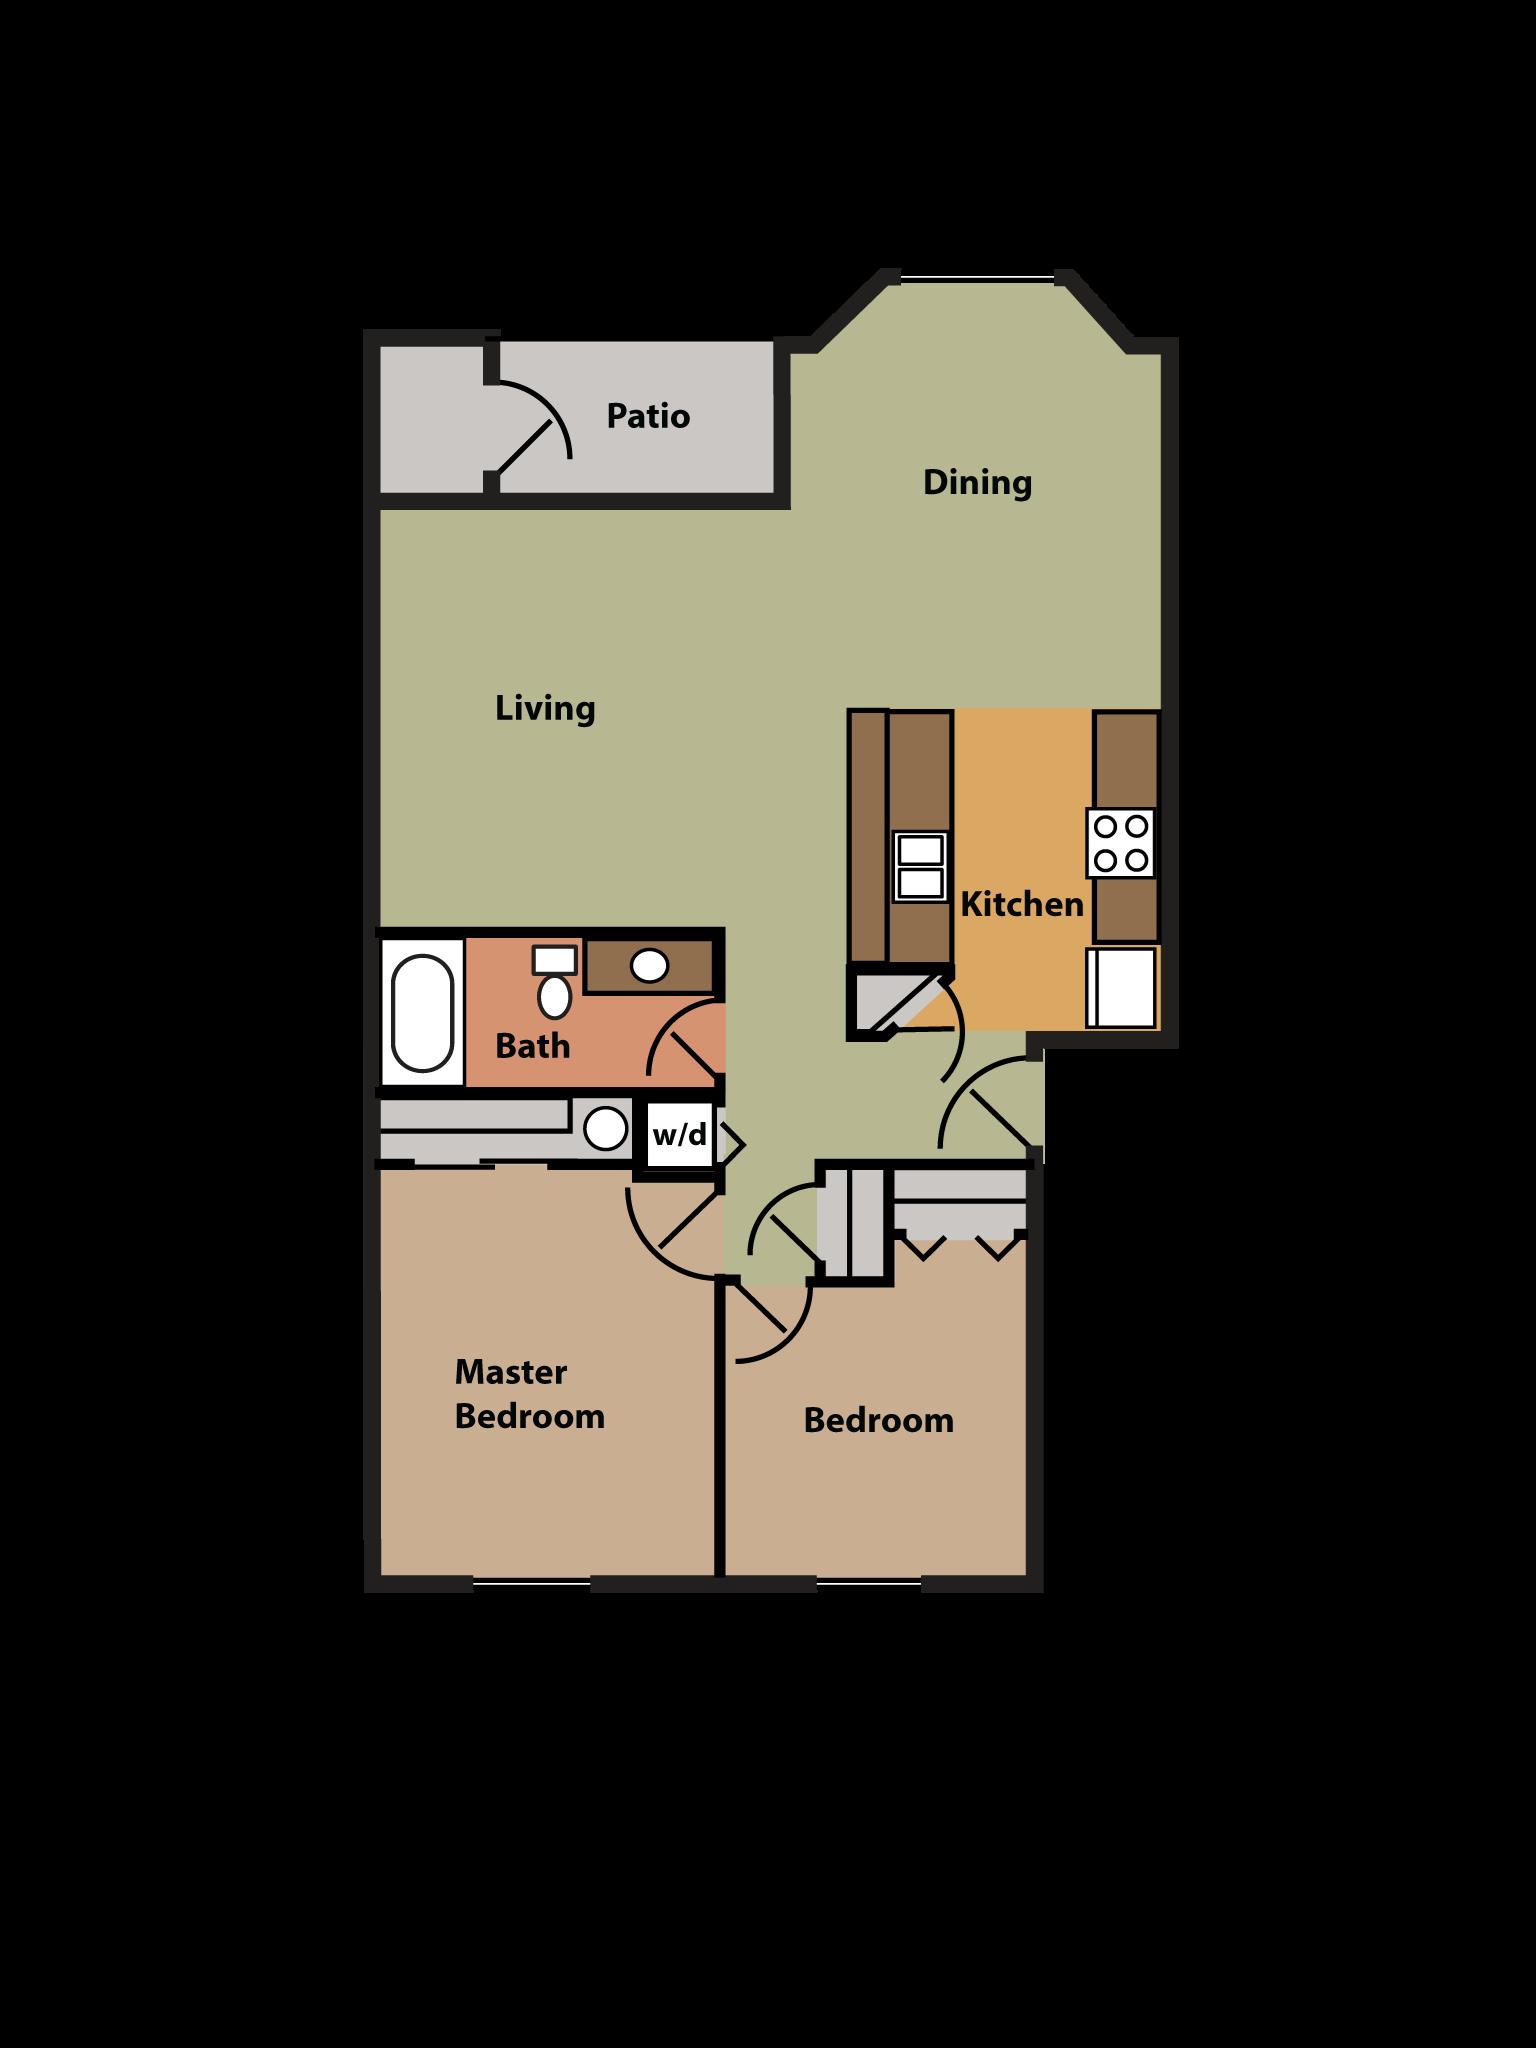 2 Bed, 1 Bath w/ Bay Window Floor Plan 5